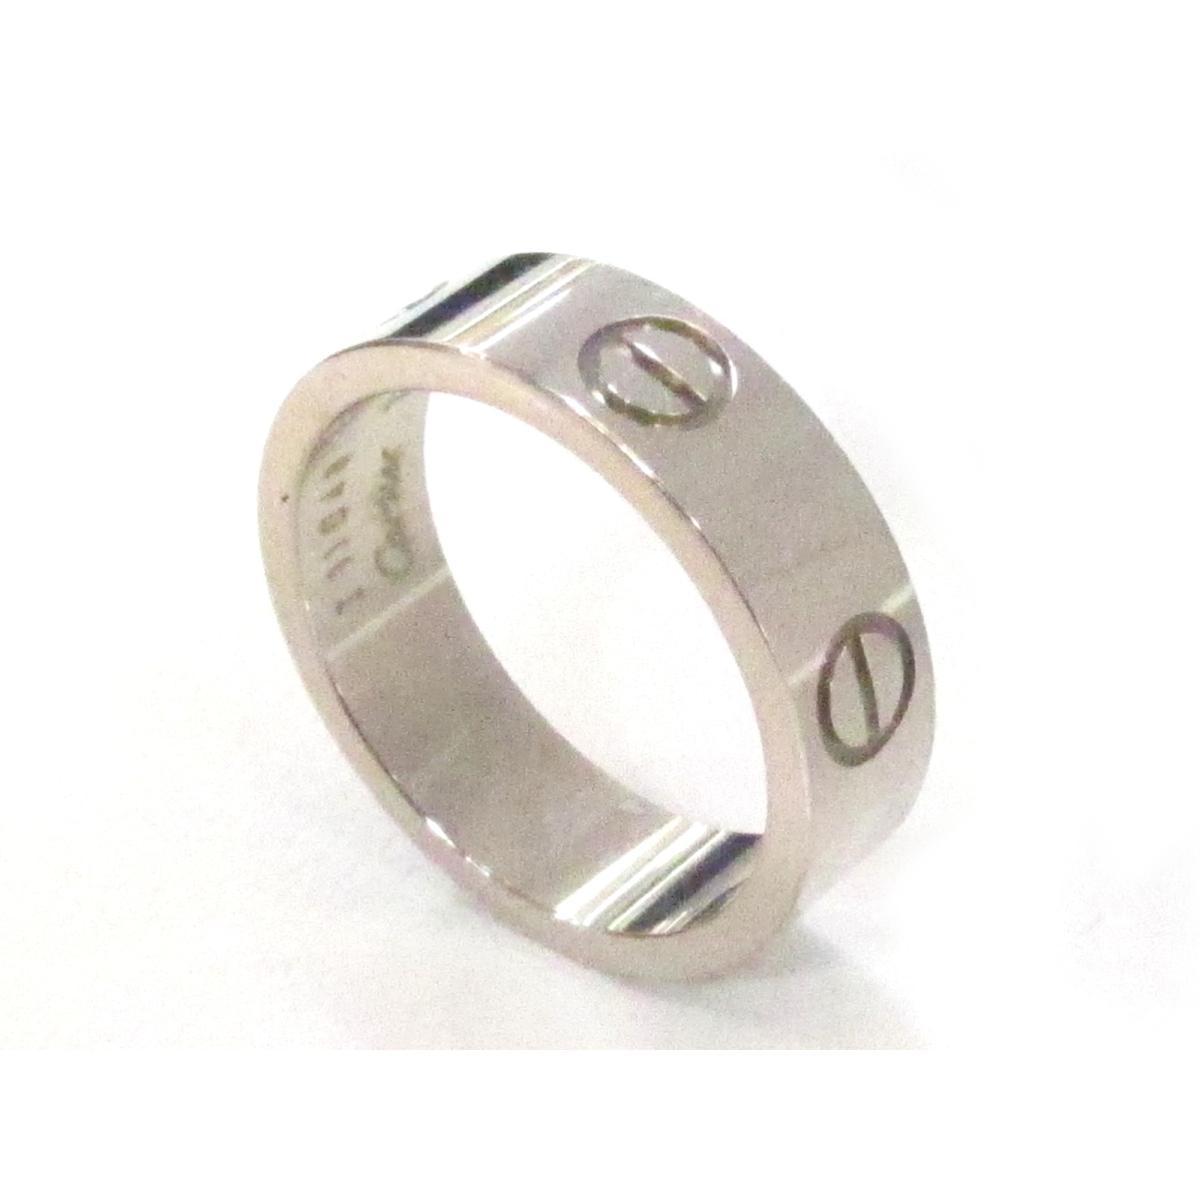 365641b61992 ... カルティエラブリング指輪ユニセックスK18WG(750)ホワイトゴールド ...